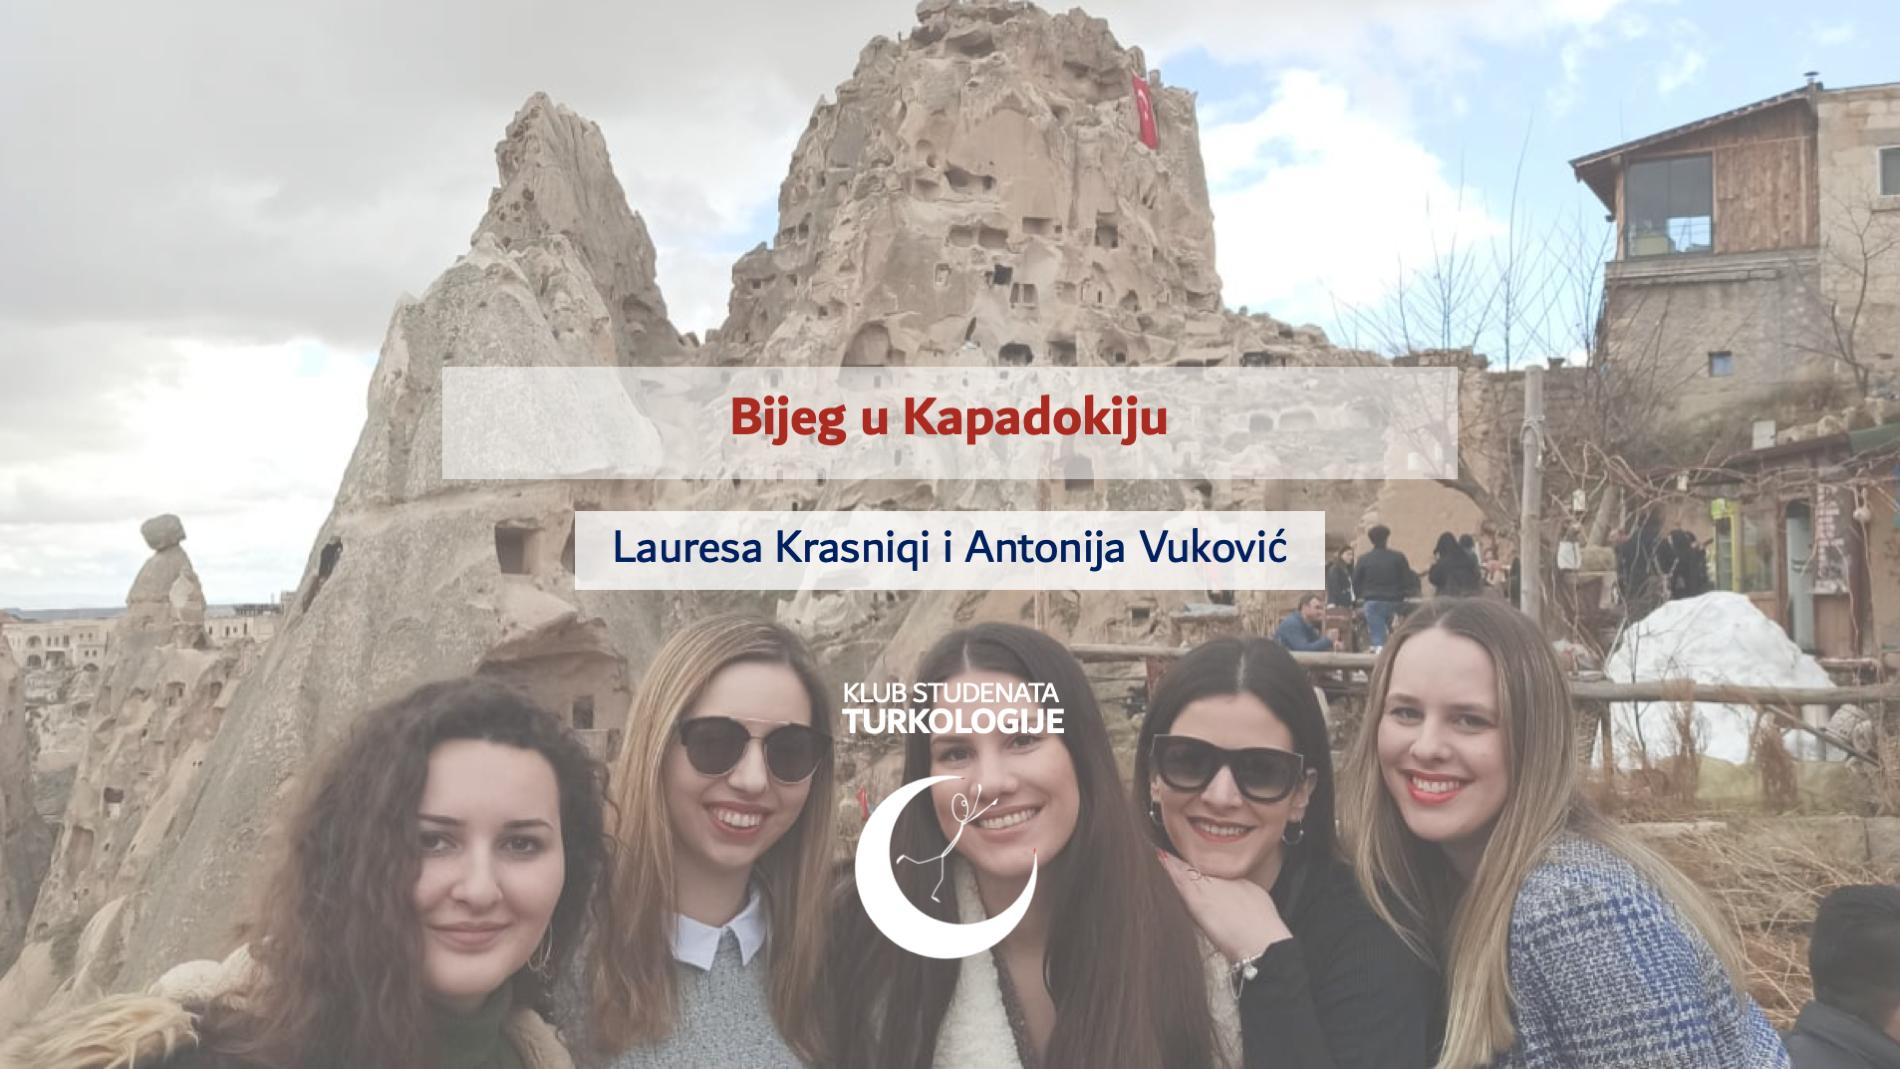 Bijeg u Kapadokiju